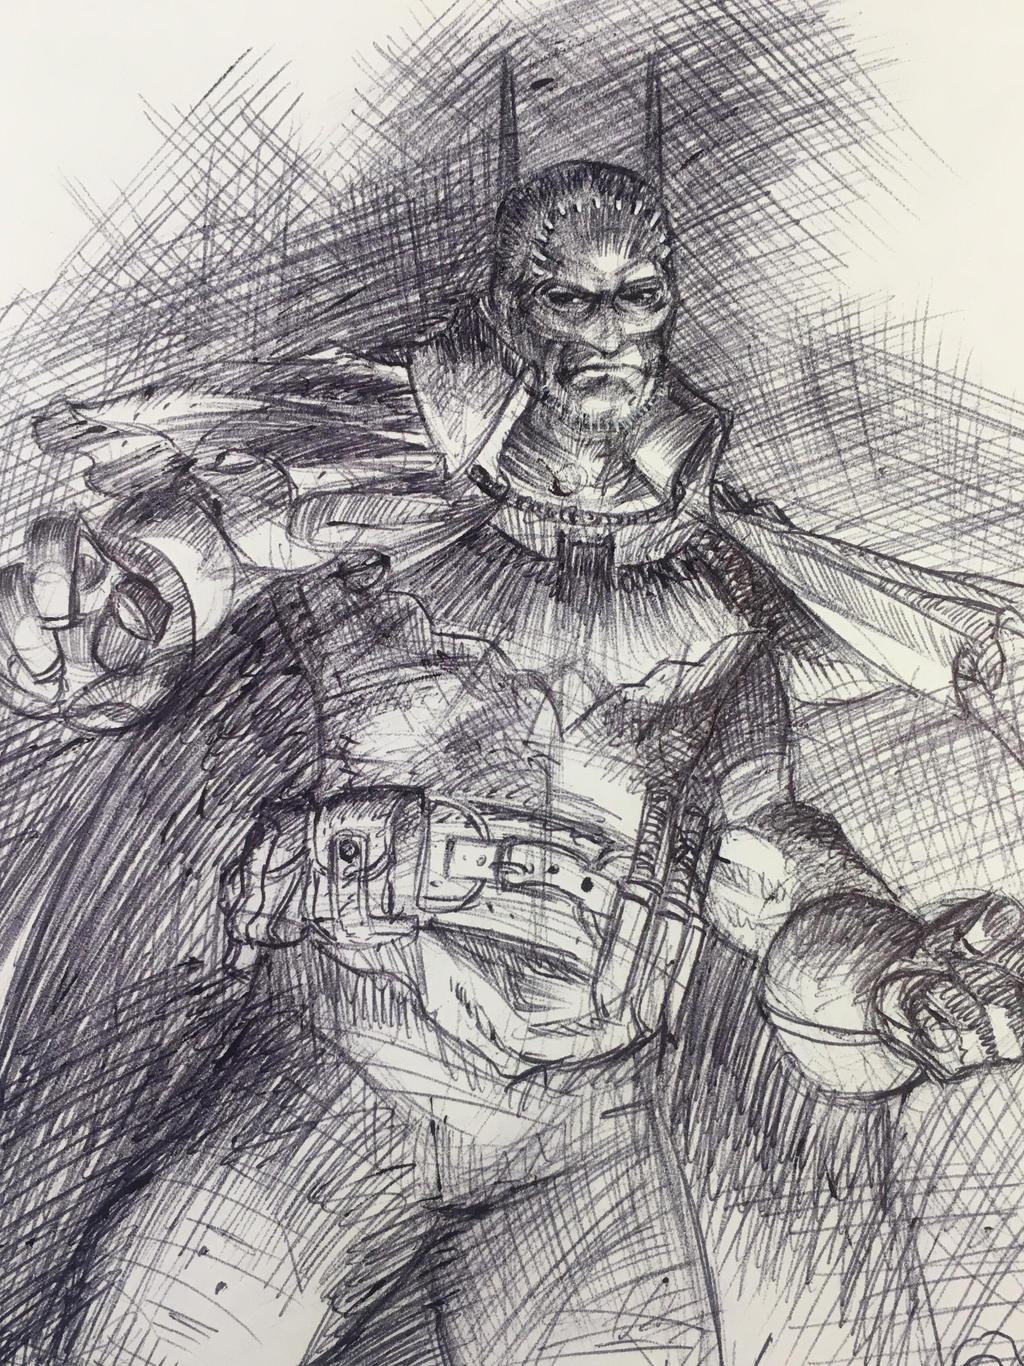 Victorian Batman ballpoint pen sketch by DrewEdwardJohnson